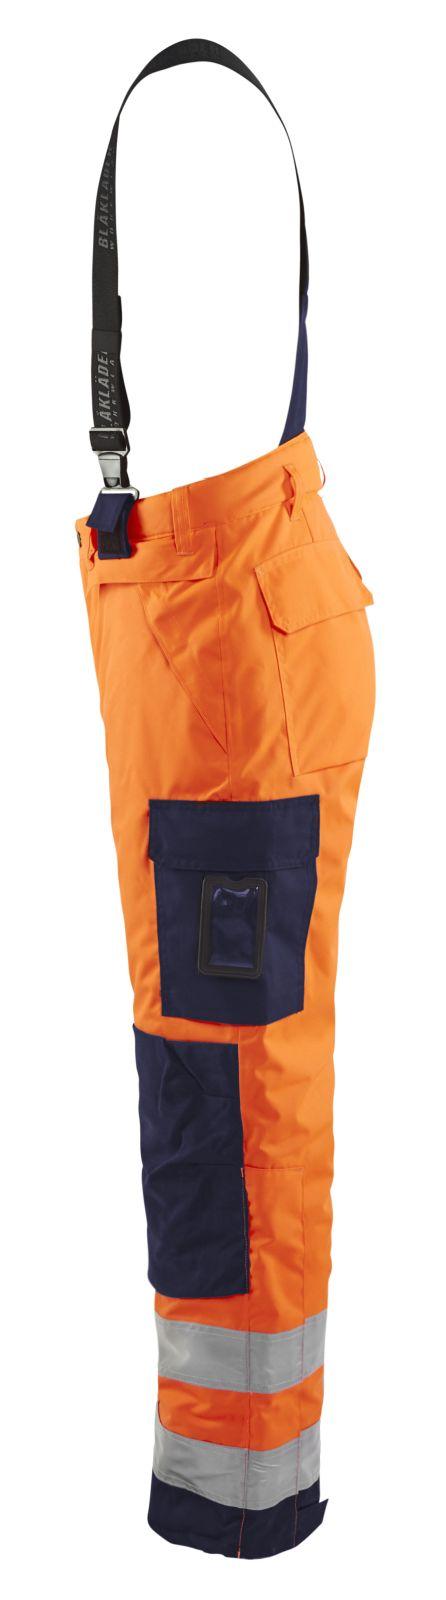 Blaklader Winterbroeken 18851977 High Vis oranje-marineblauw(5389)